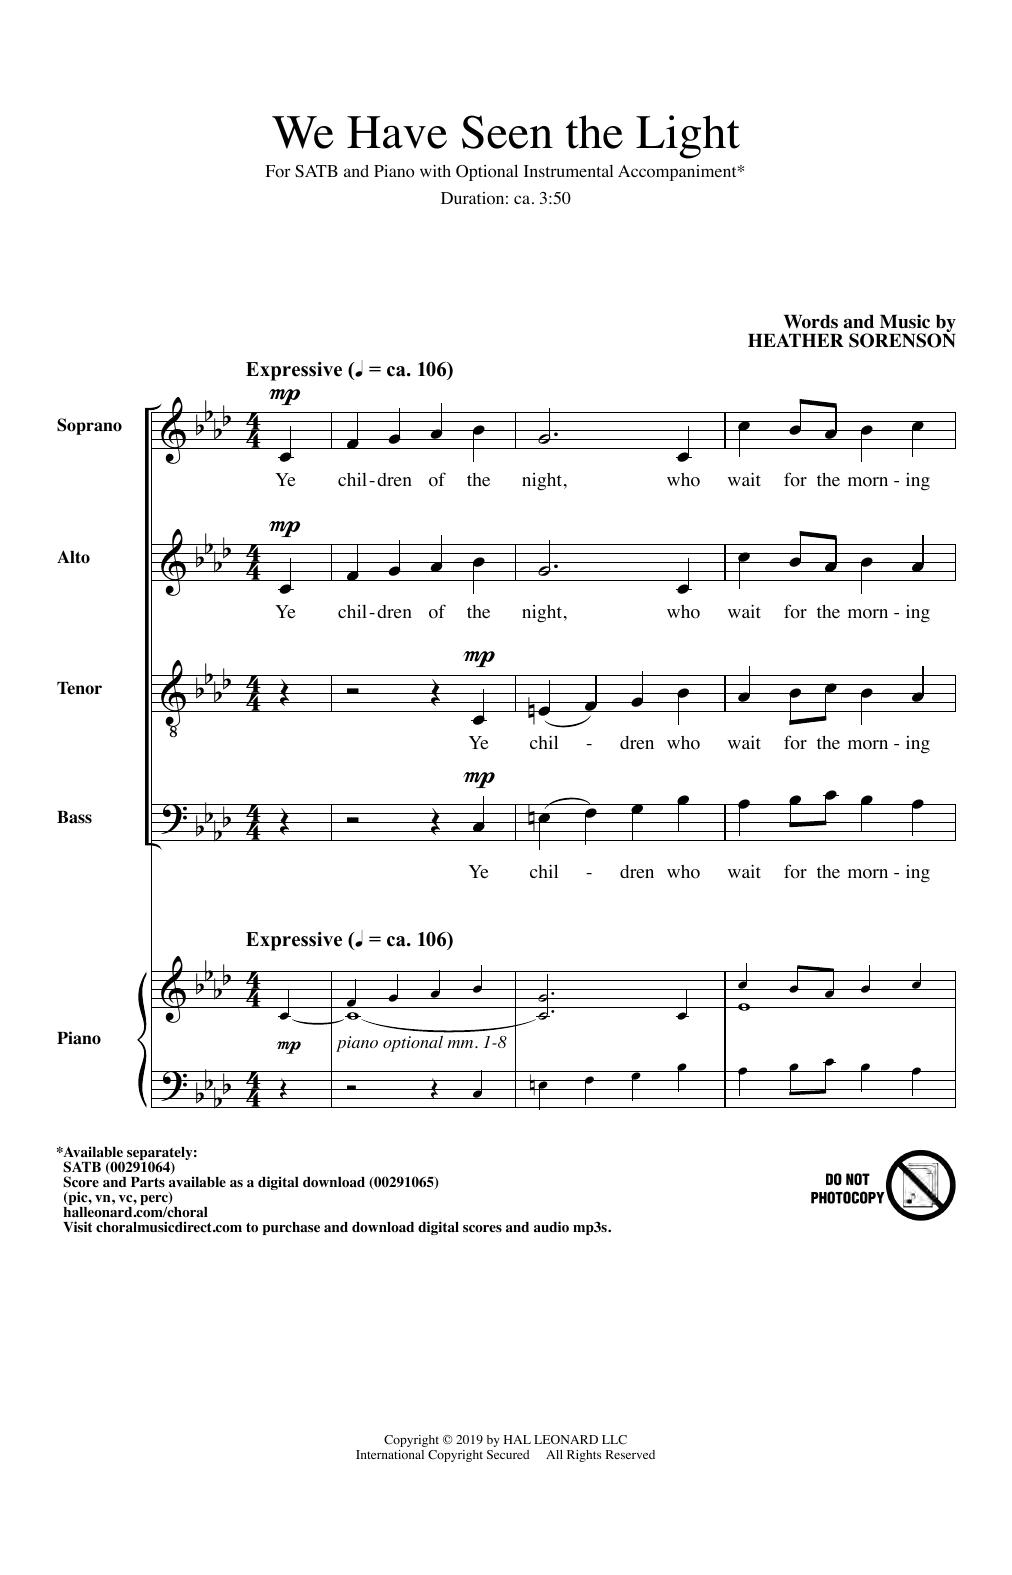 We Have Seen The Light (SATB Choir)